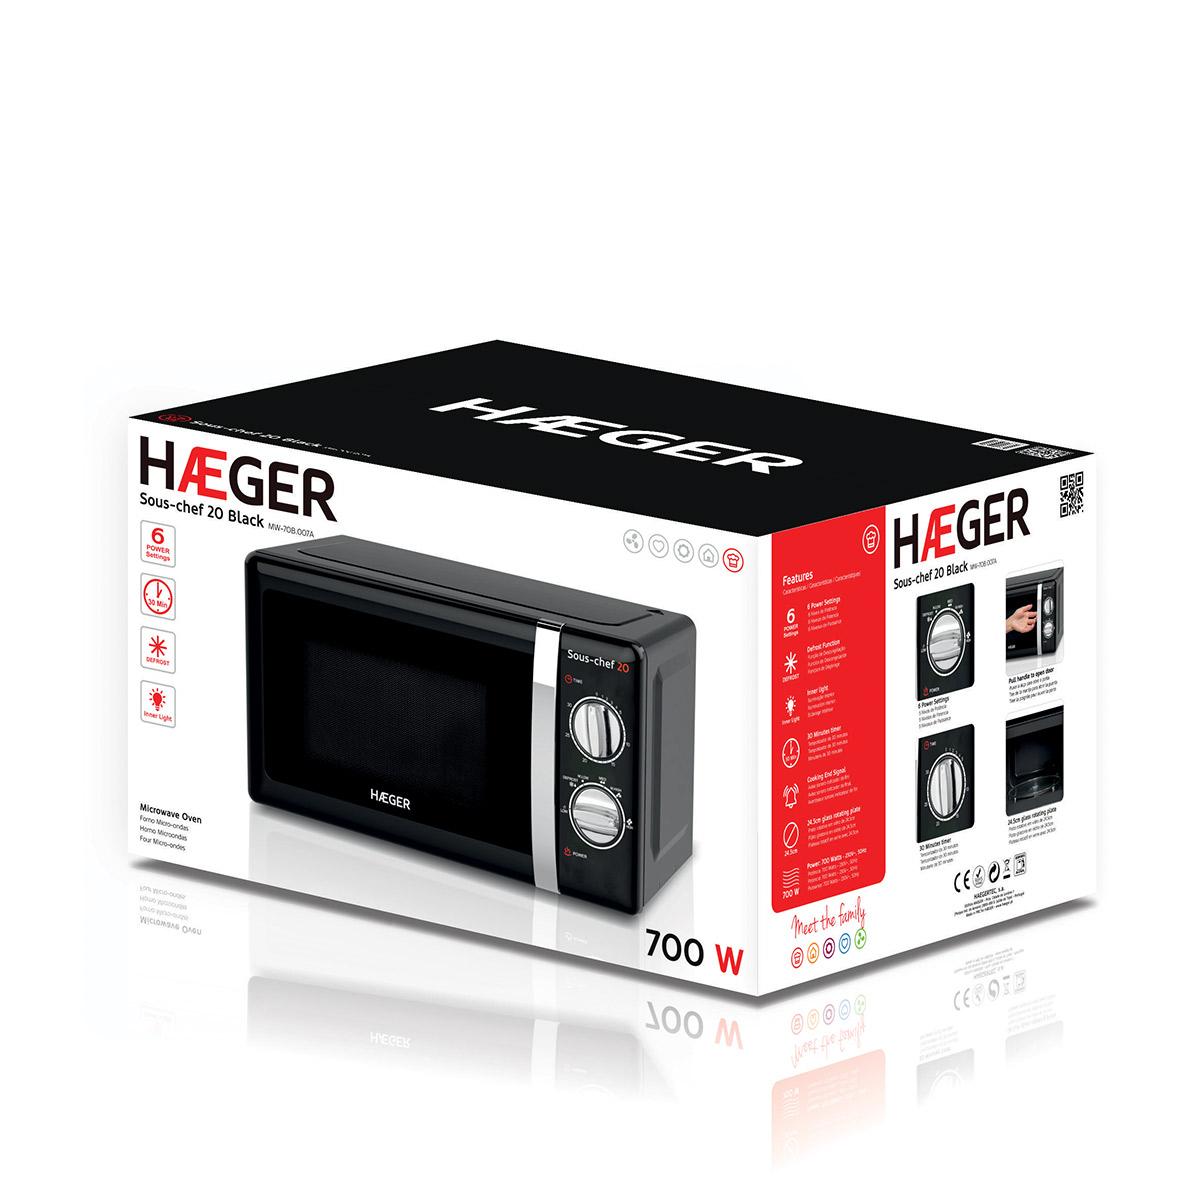 micro-ondas-com-6-niveis-haeger-sous-chef-20-black-700-w-20-lt-cor-preta-img-000